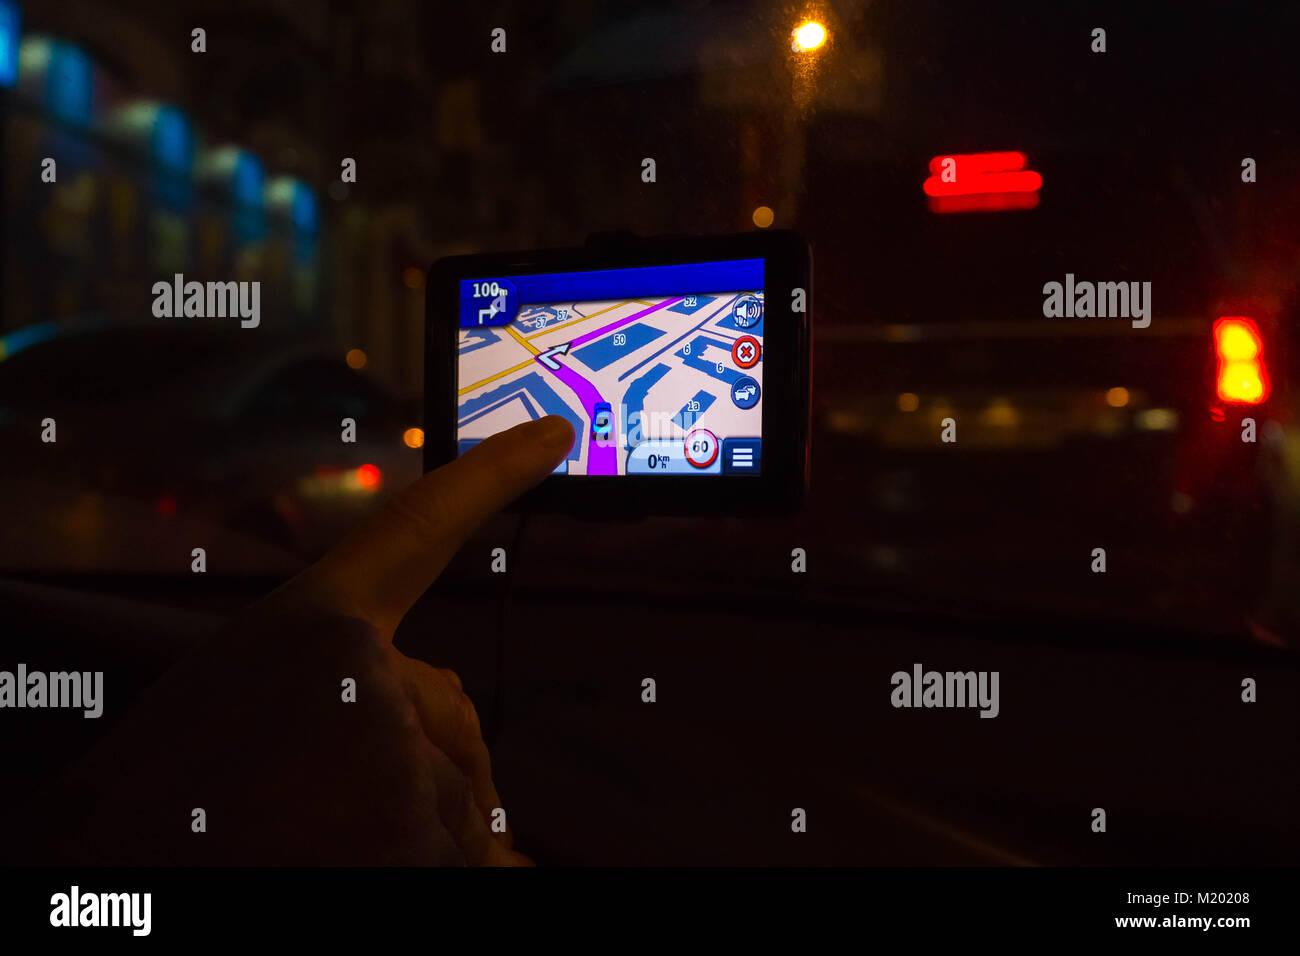 Navigation system in car - Stock Image